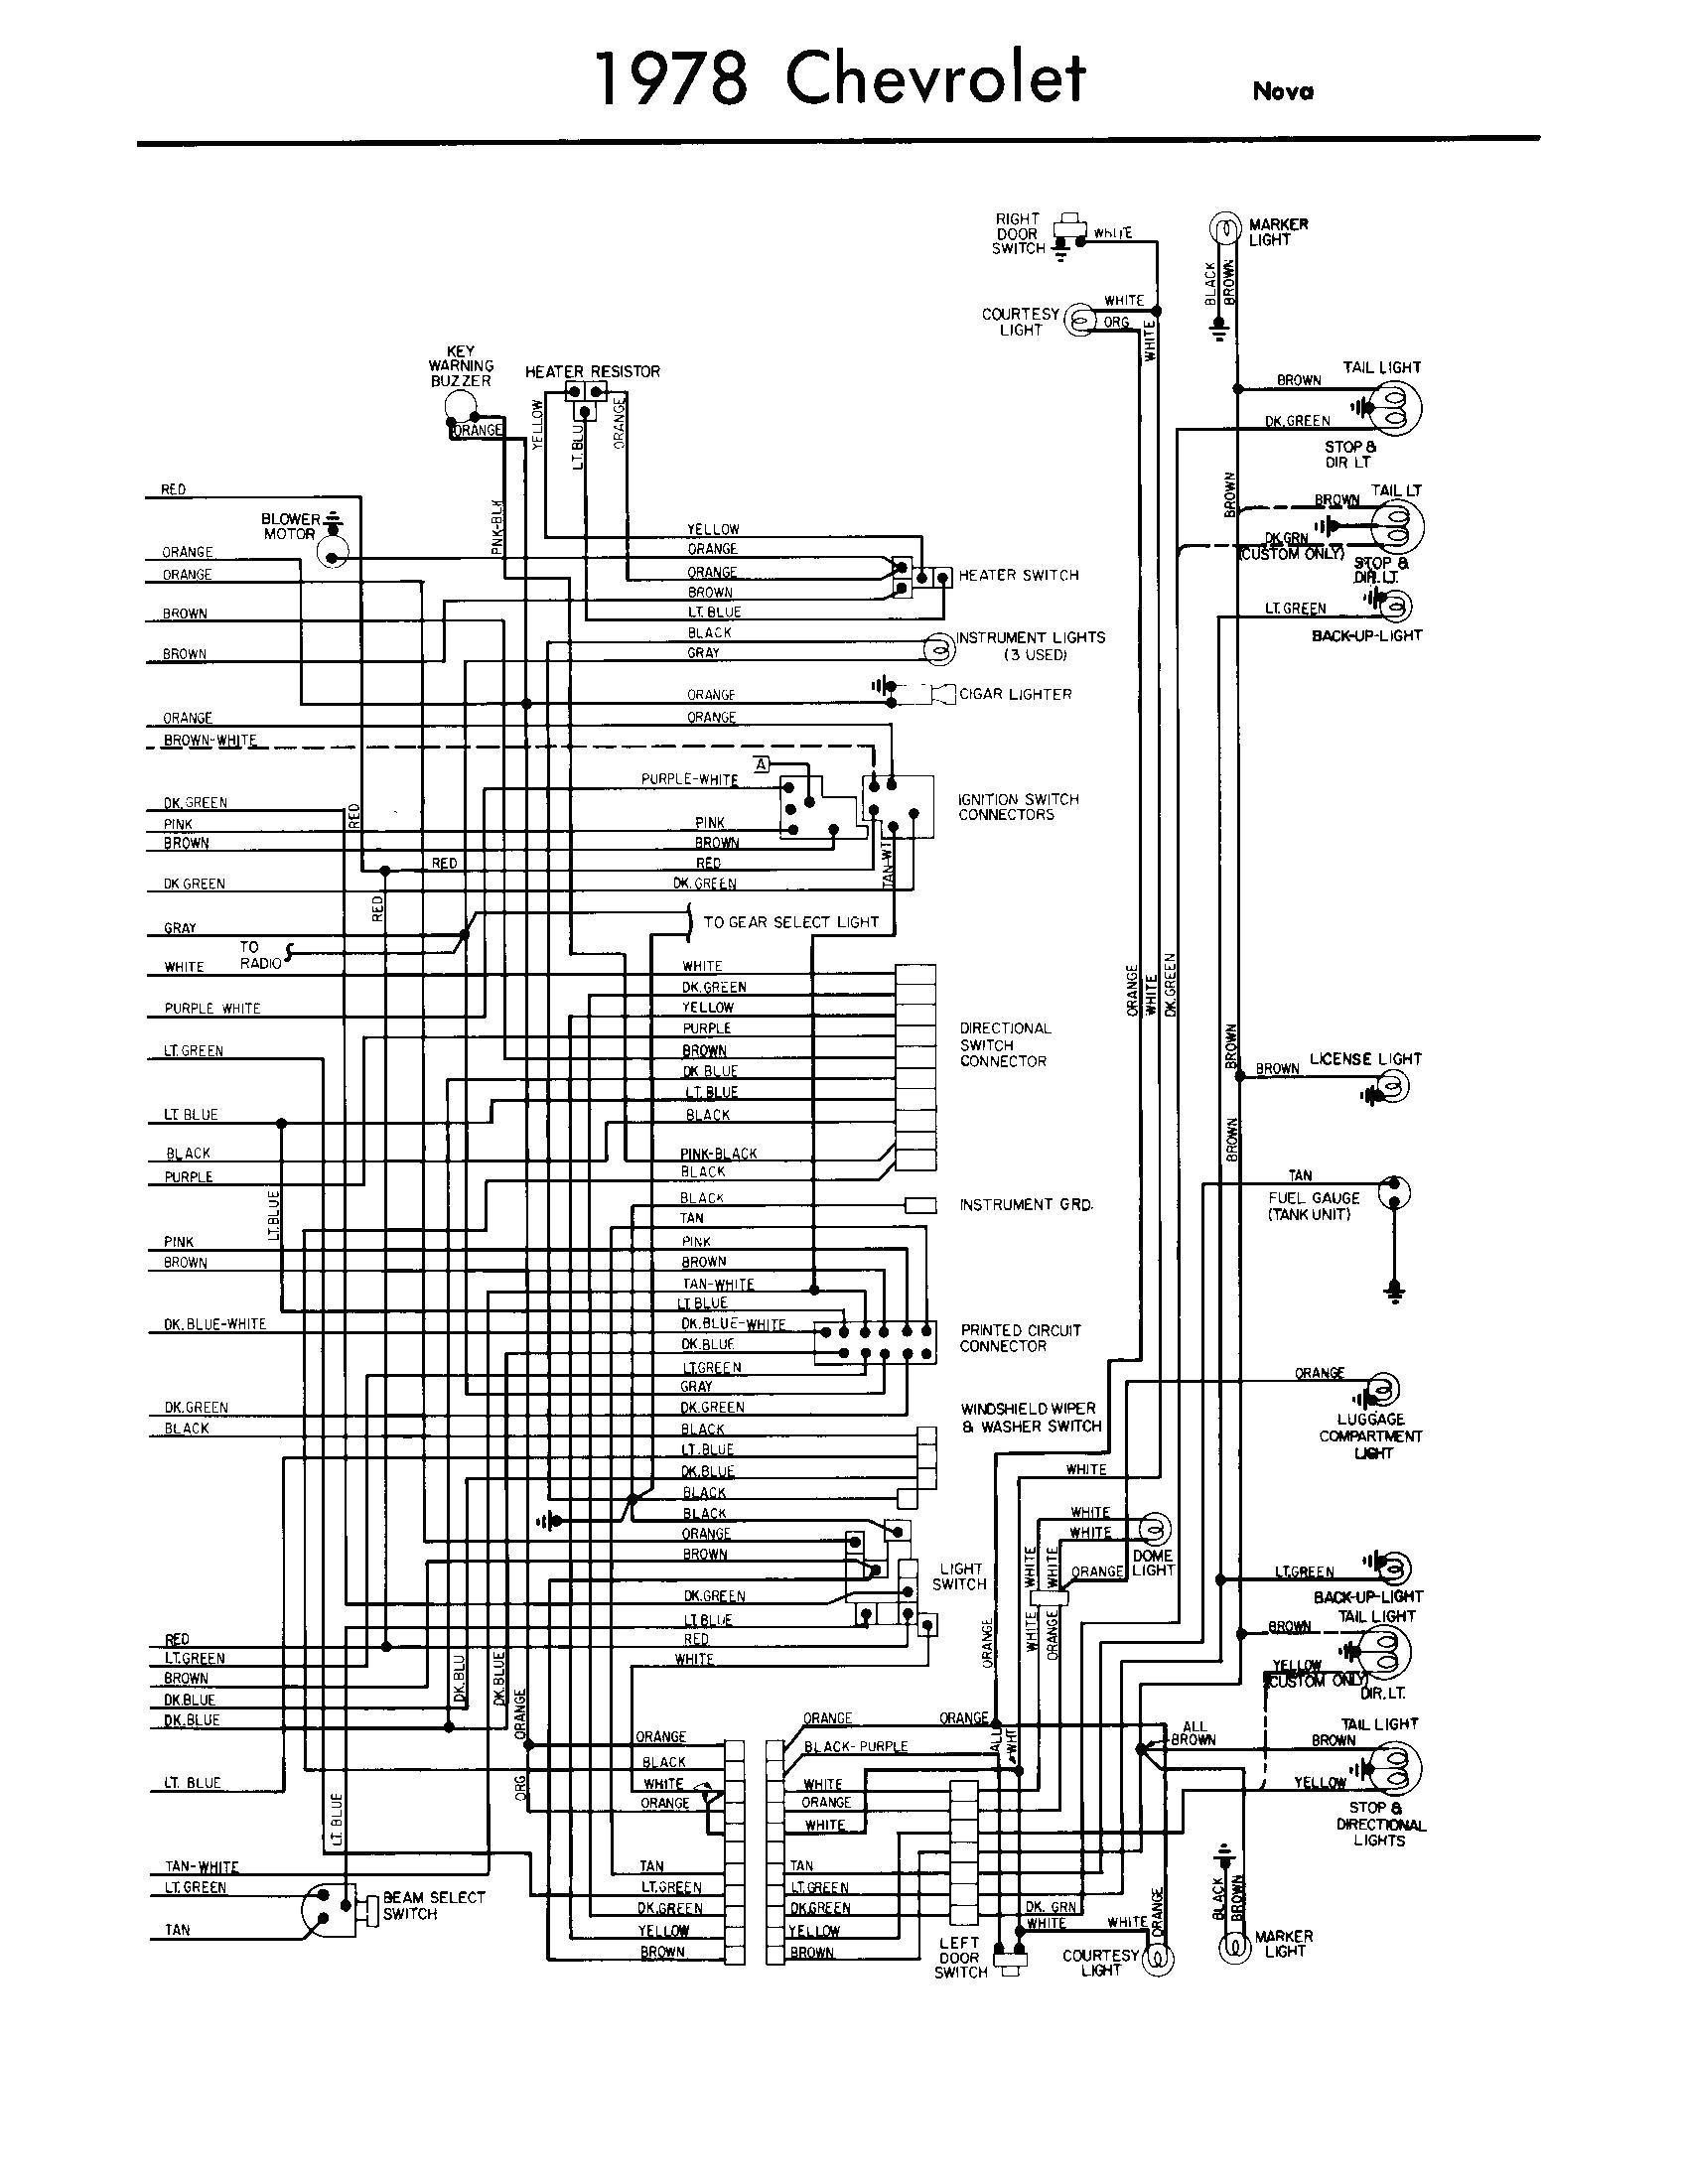 free corvette wiring diagram wiring diagram blog 84 chevy wiring diagram free download schematic